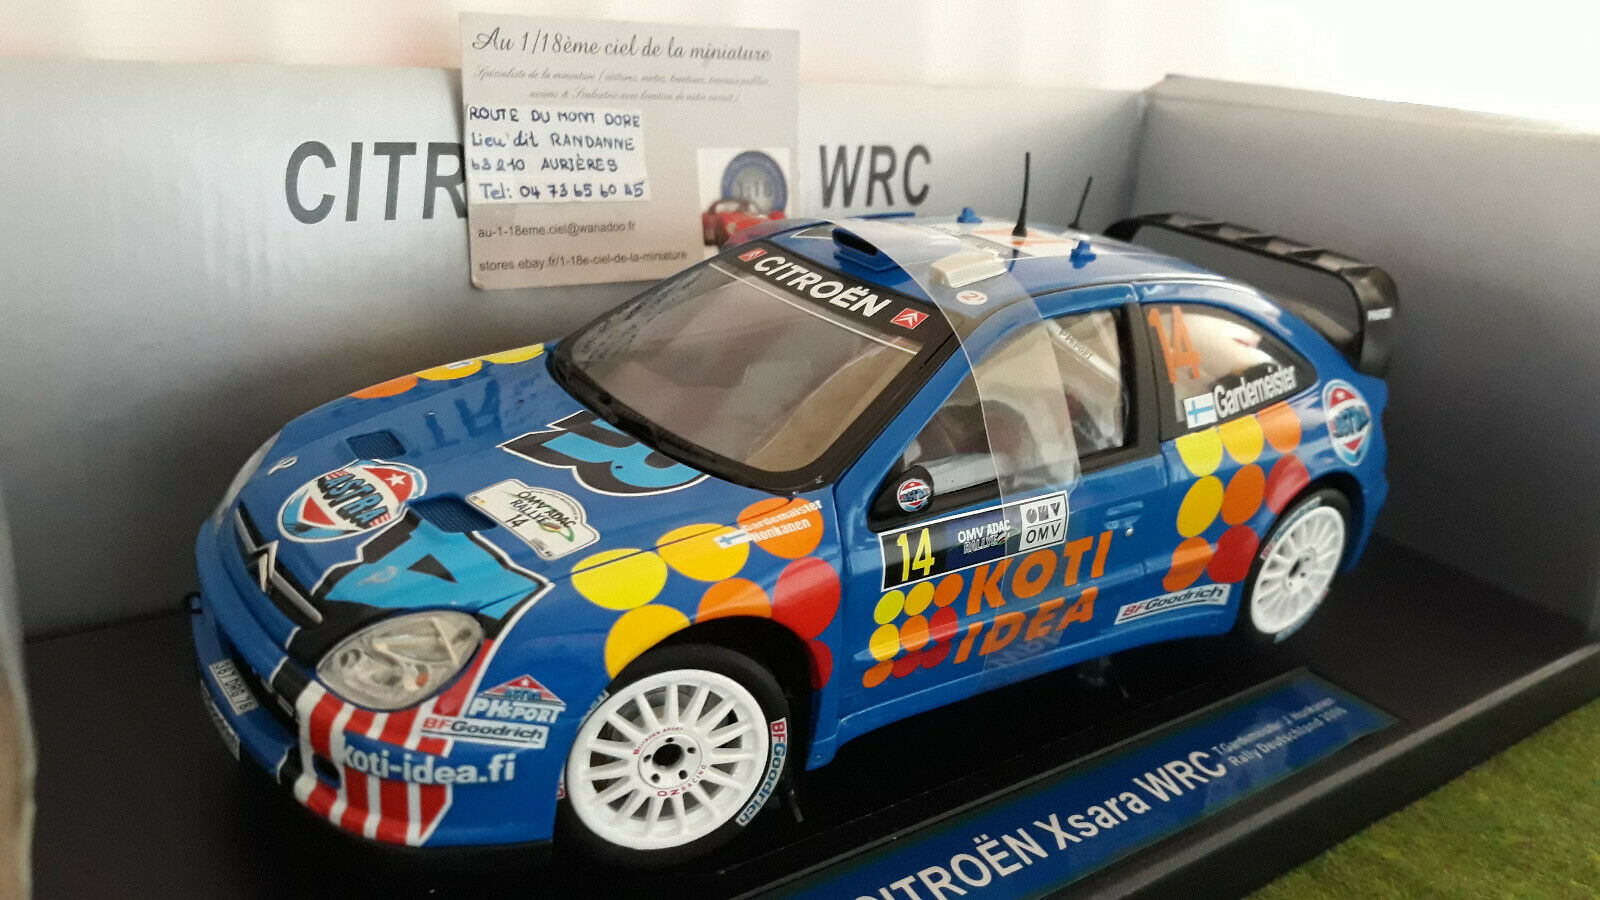 Garantía 100% de ajuste CITROËN XSARA WRC 2006 2006 2006 G RALLYE DEUTSCHLAND 1 18 SUN Estrella 4428 voiture miniature  colores increíbles